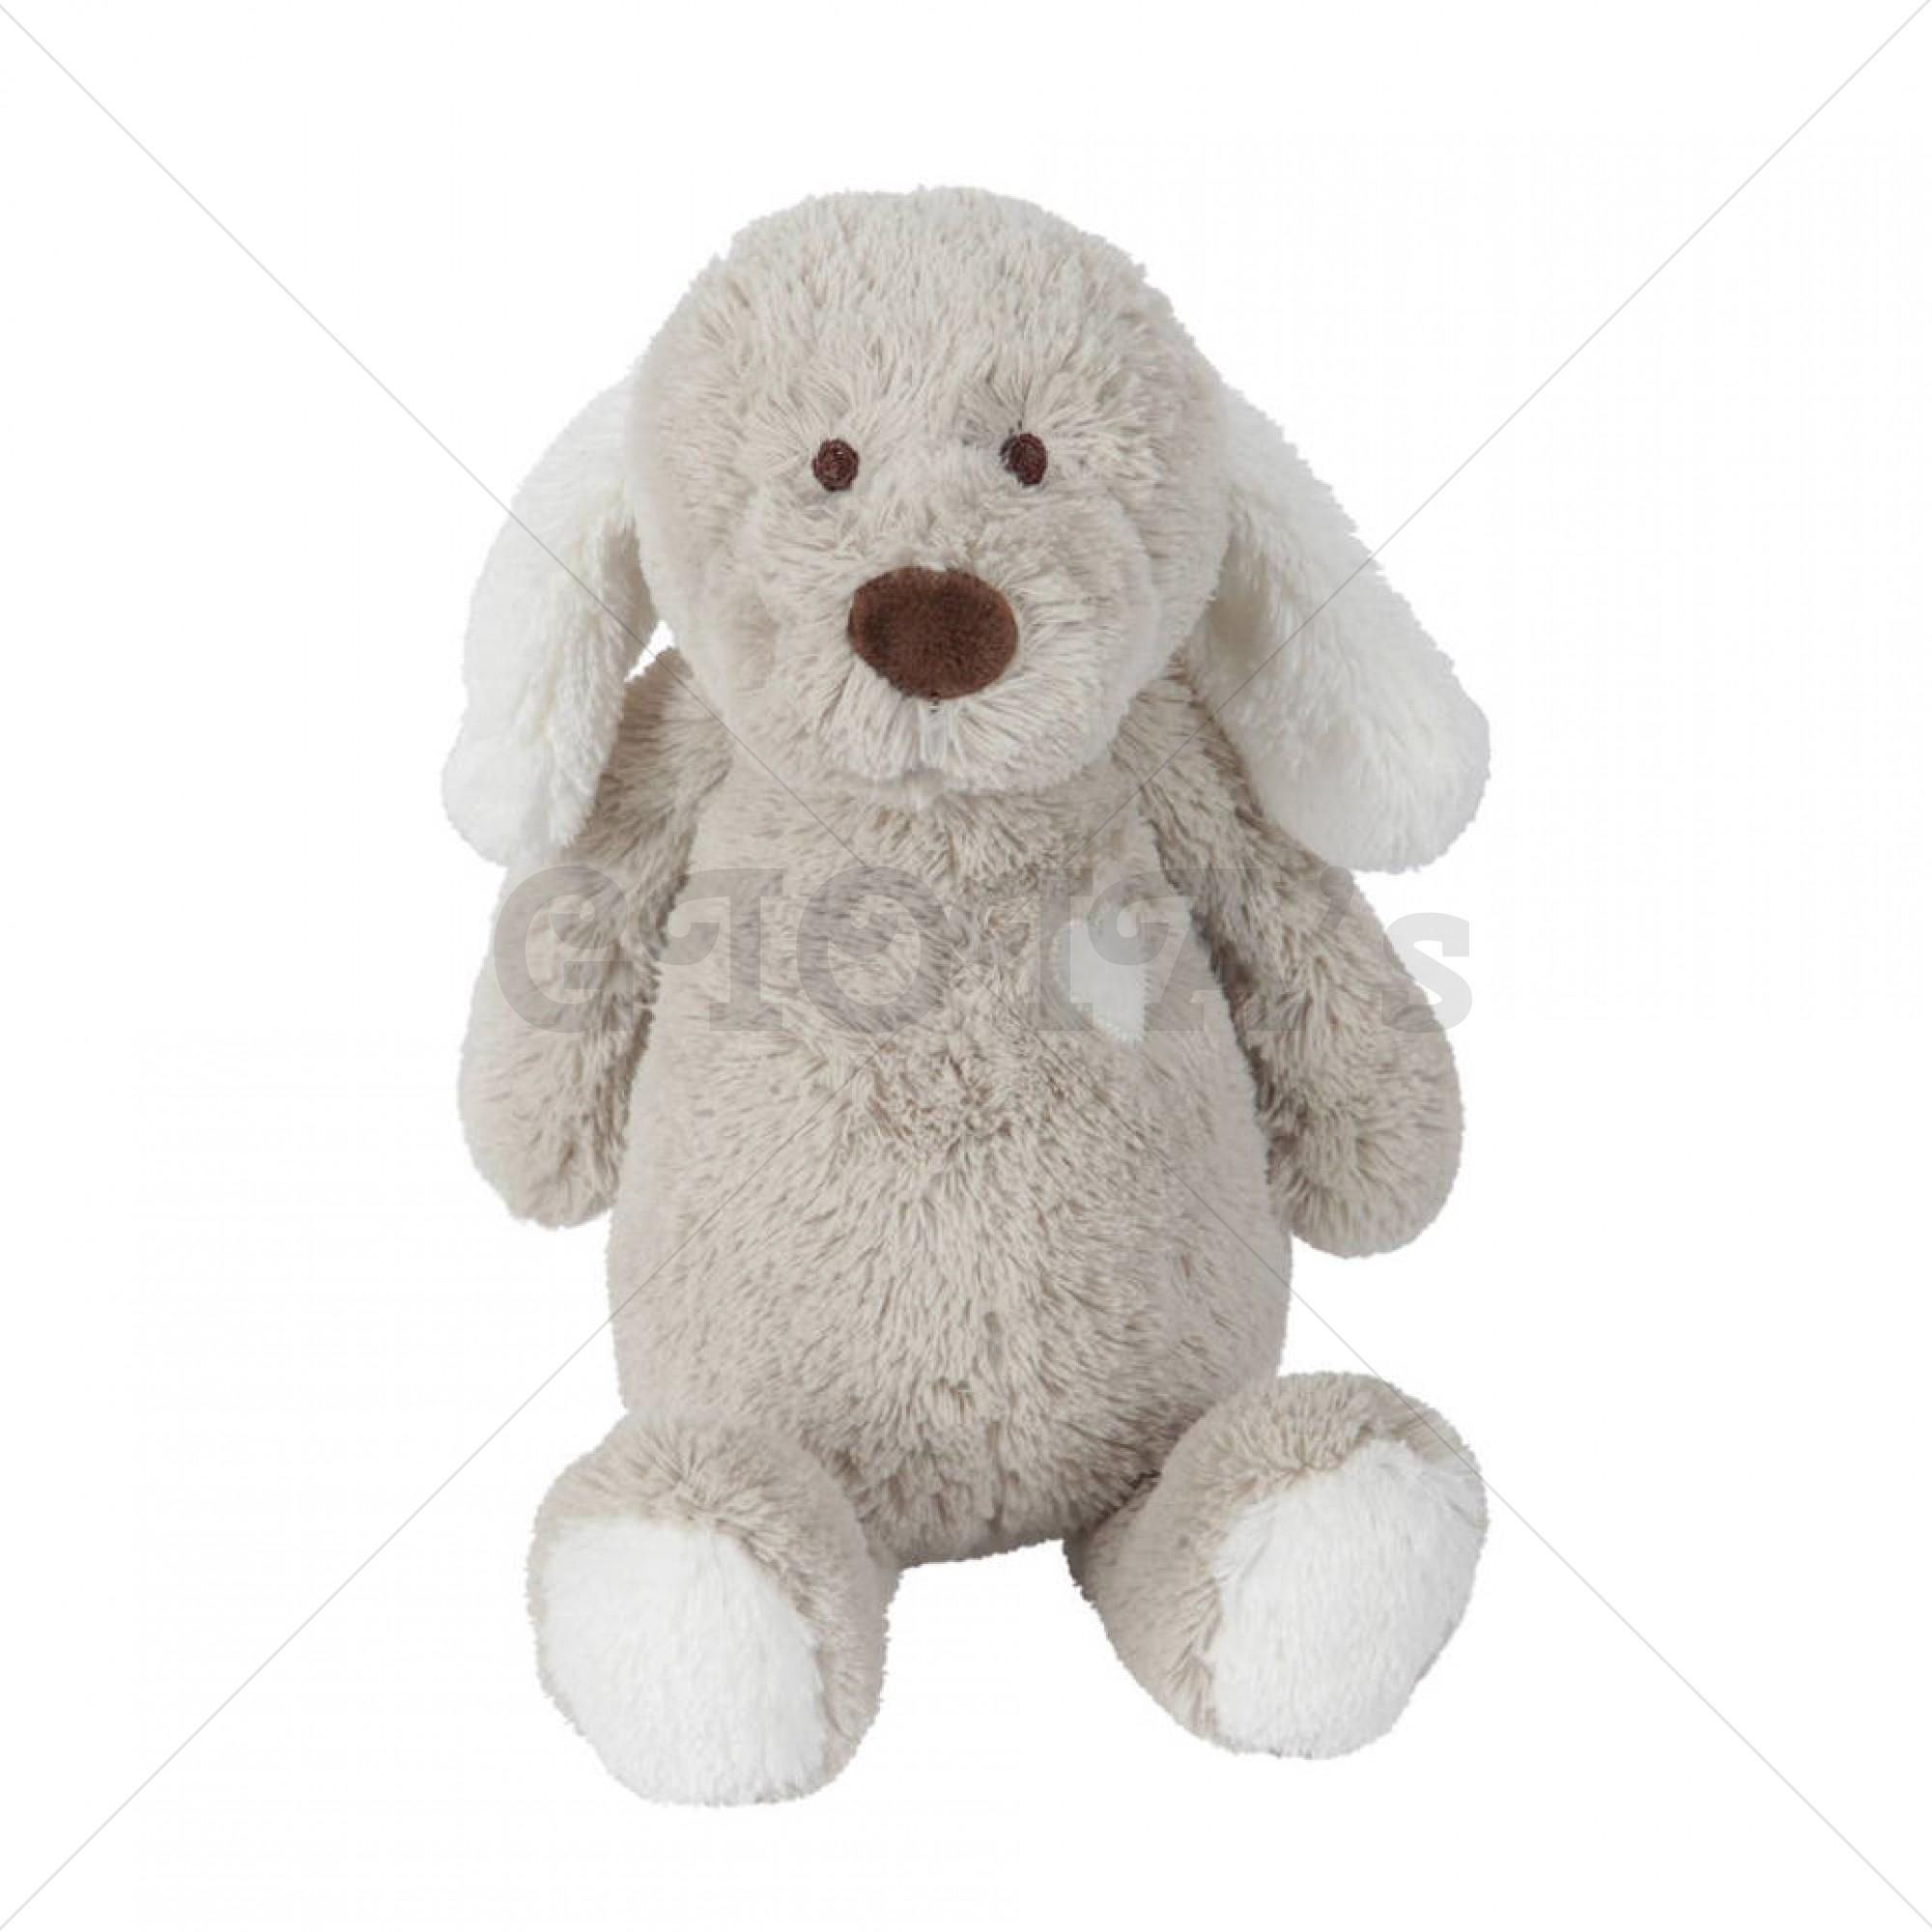 6914405f0b1fd5 Pluche hond - Tiamo 30cm - GIOIA's cadeau en feestartikelen